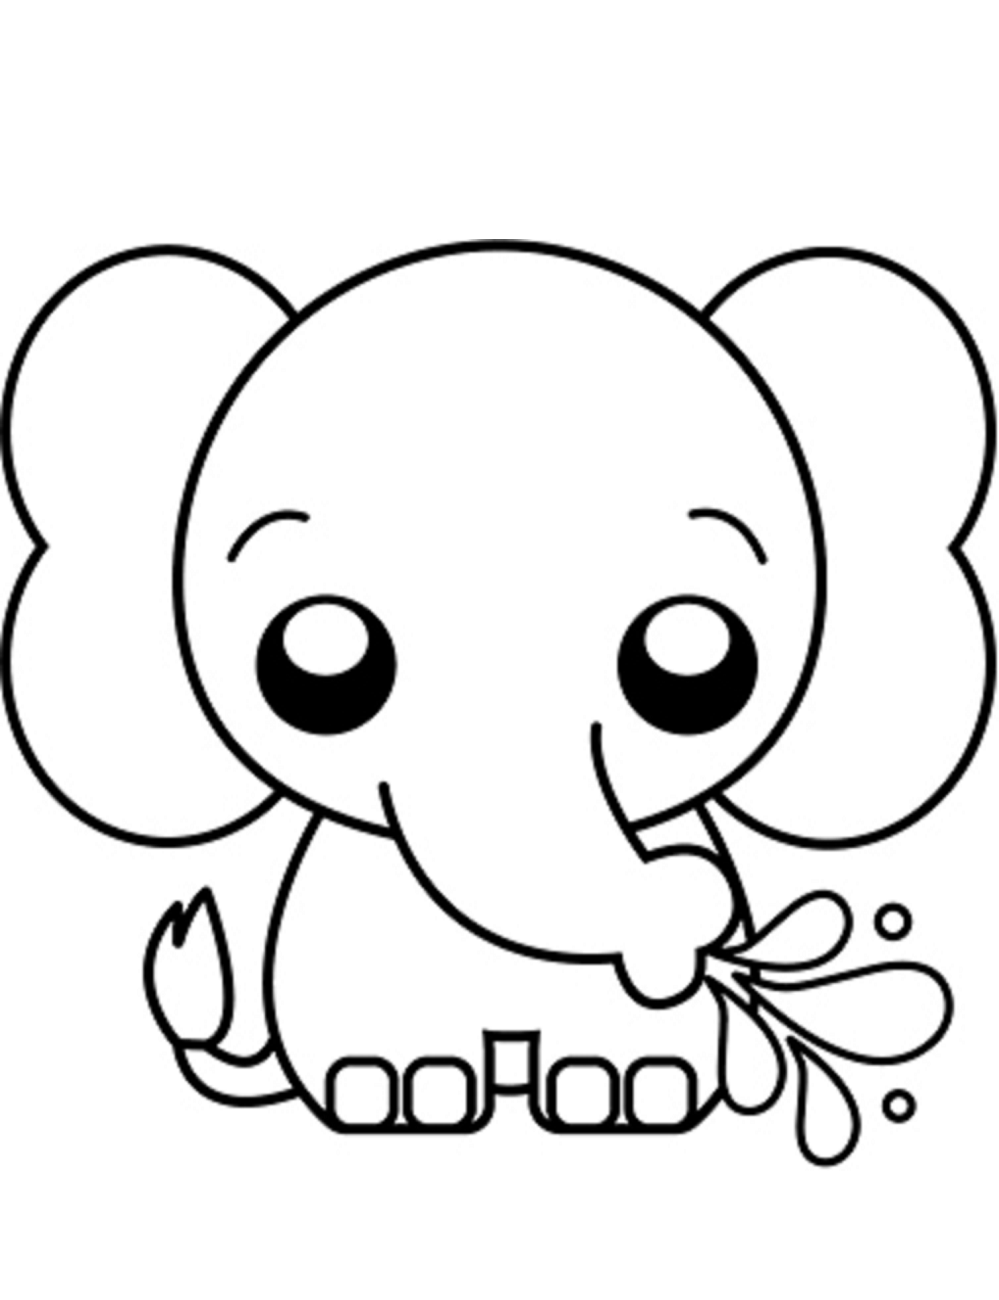 Dibujos de Elefante Kawaii para Colorear, Pintar e ...